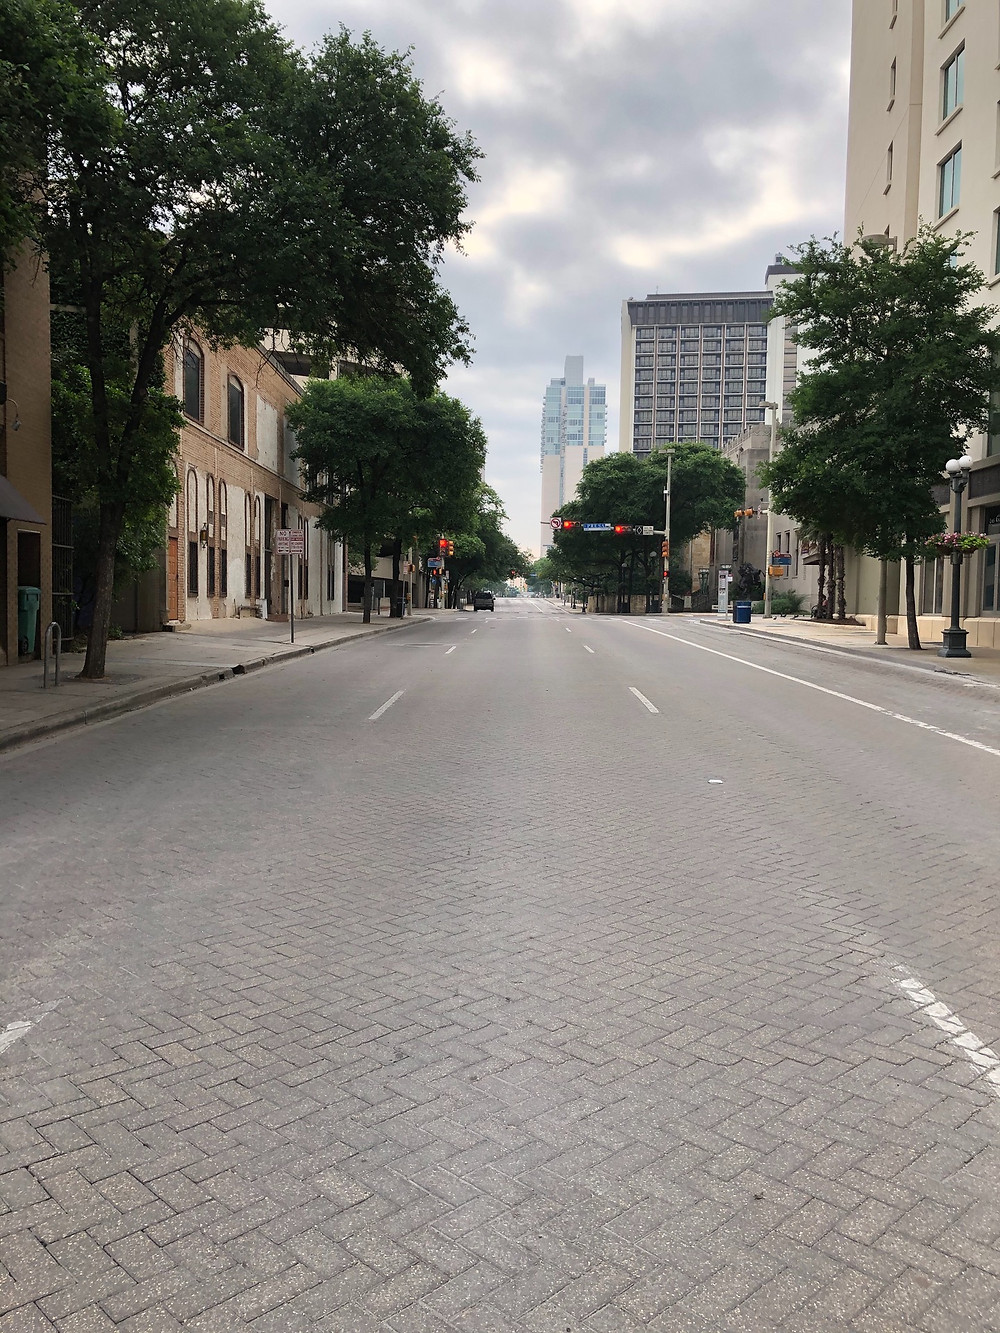 A view down an empty Losoya Street